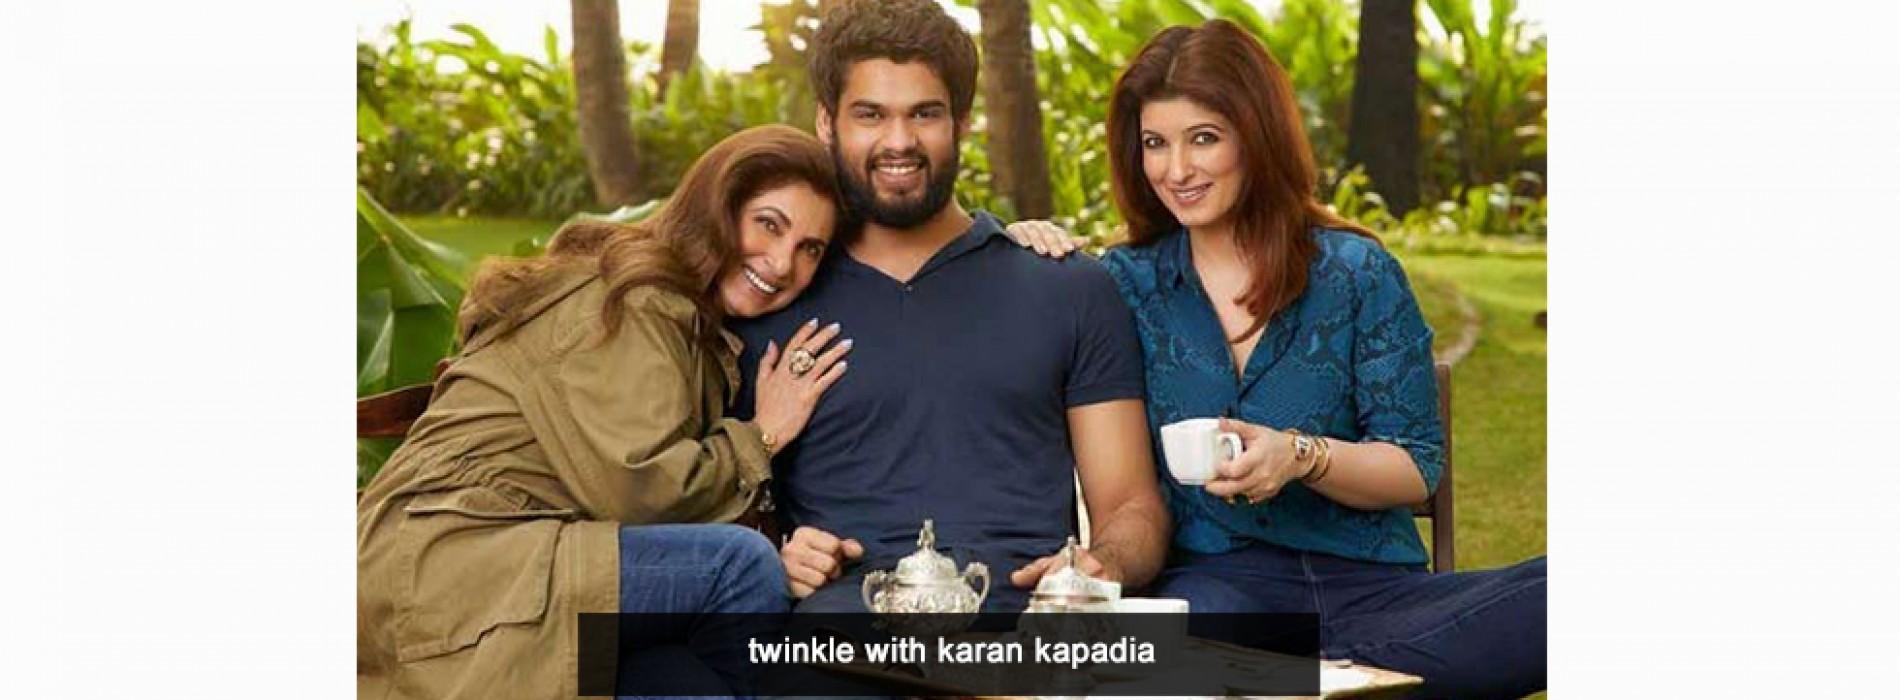 Nishant Pitti producing a film with Twinkle Khanna's cousin Karan Kapadia